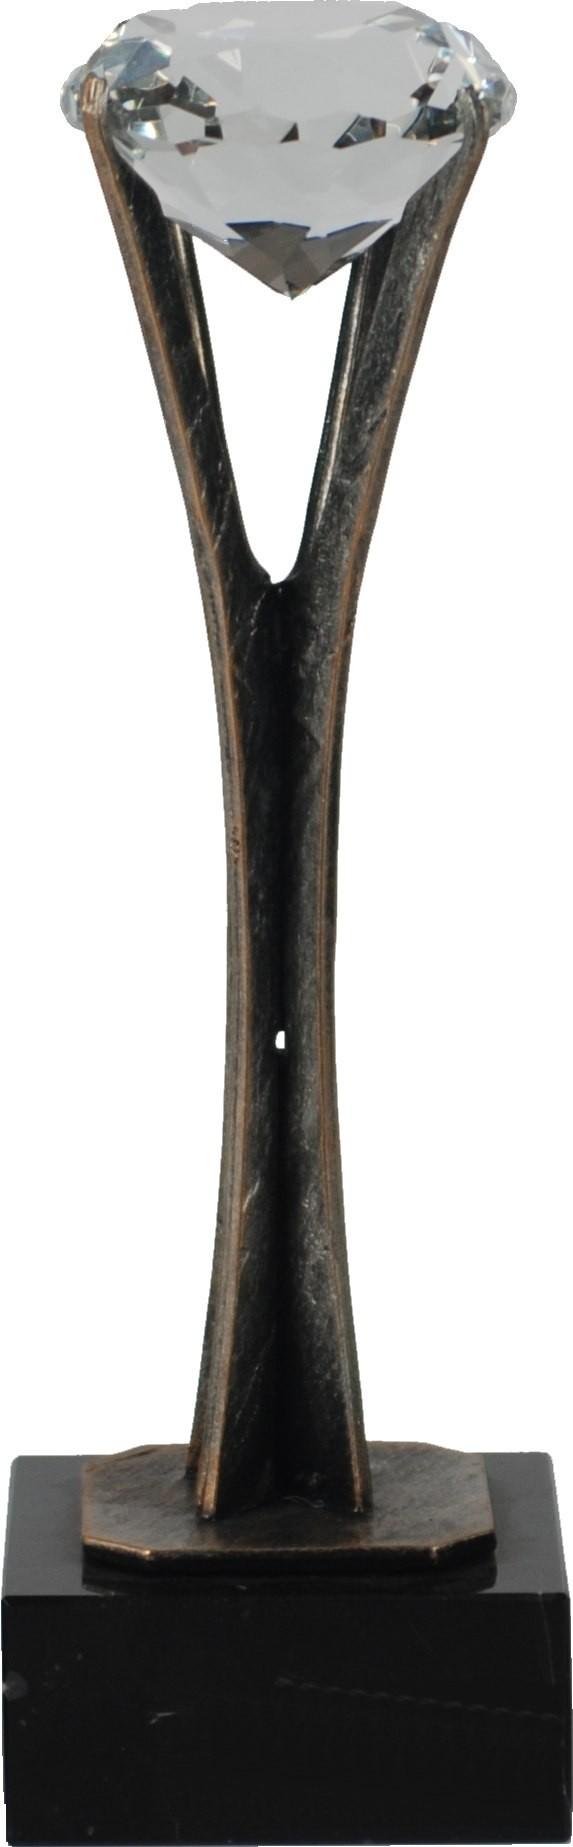 Award WTRC 311B 28cm